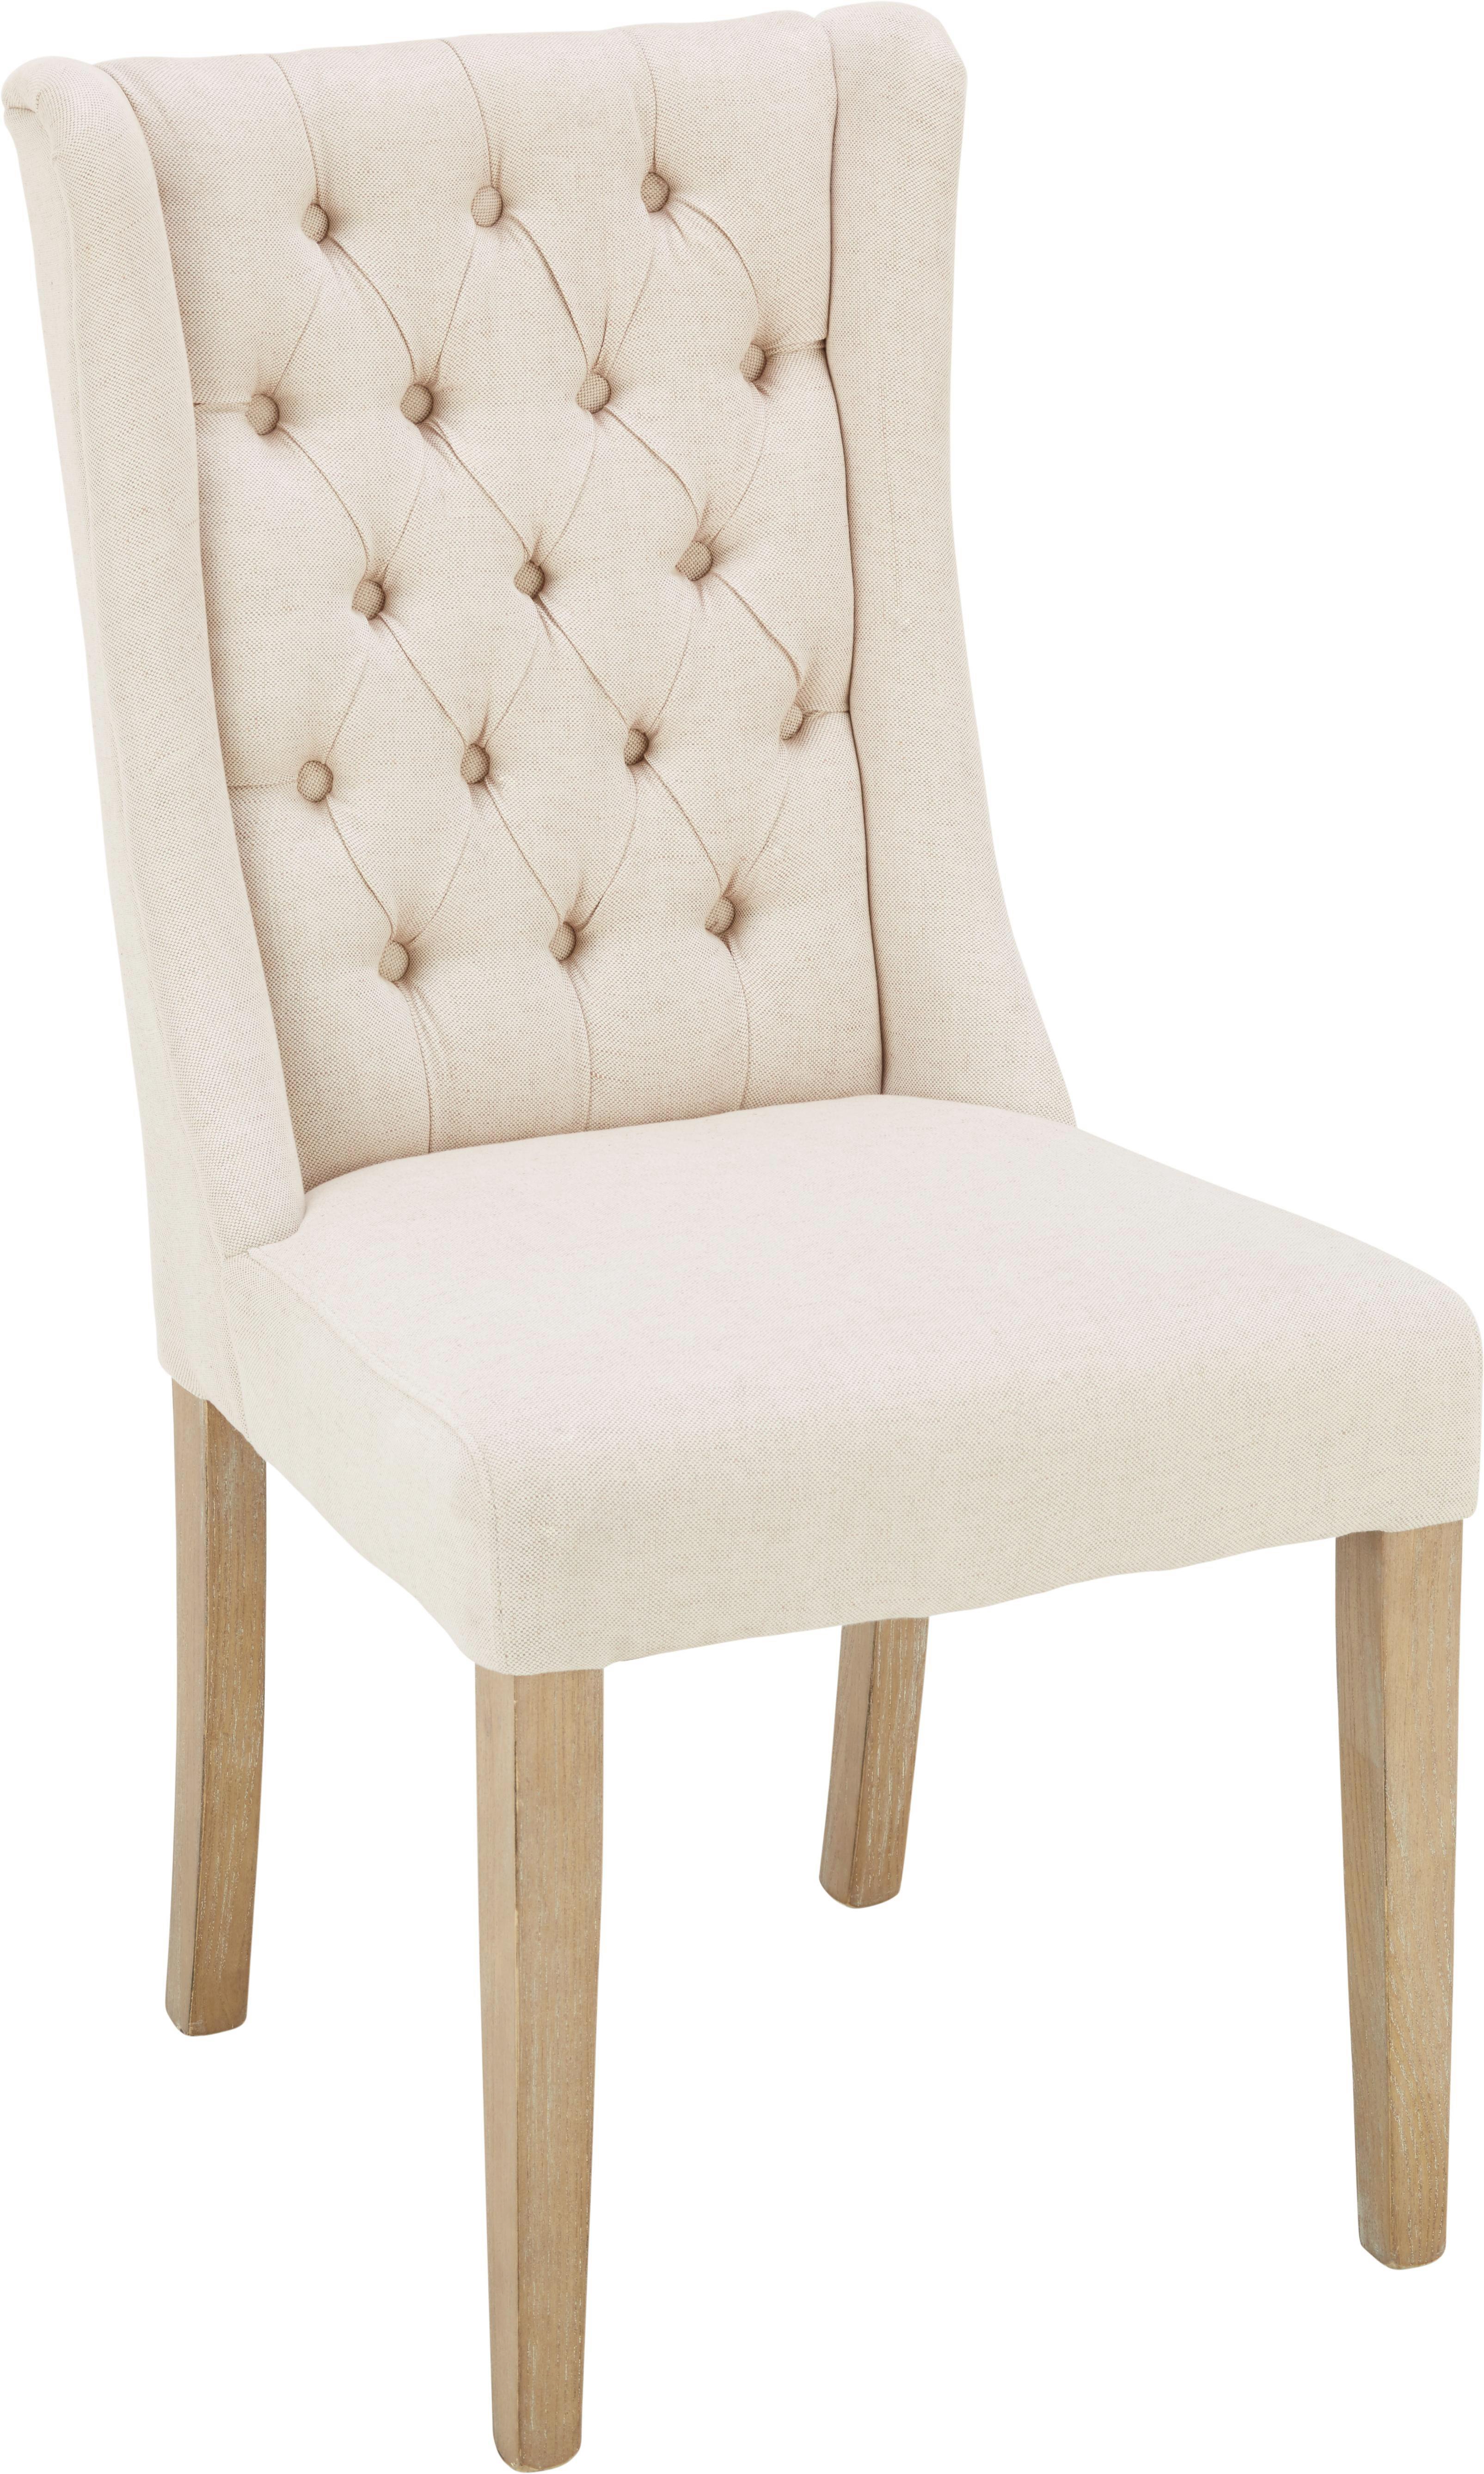 Stuhl in Creme/eschefarben - Eschefarben/Creme, ROMANTIK / LANDHAUS, Holz/Textil (51/104/63cm) - ZANDIARA